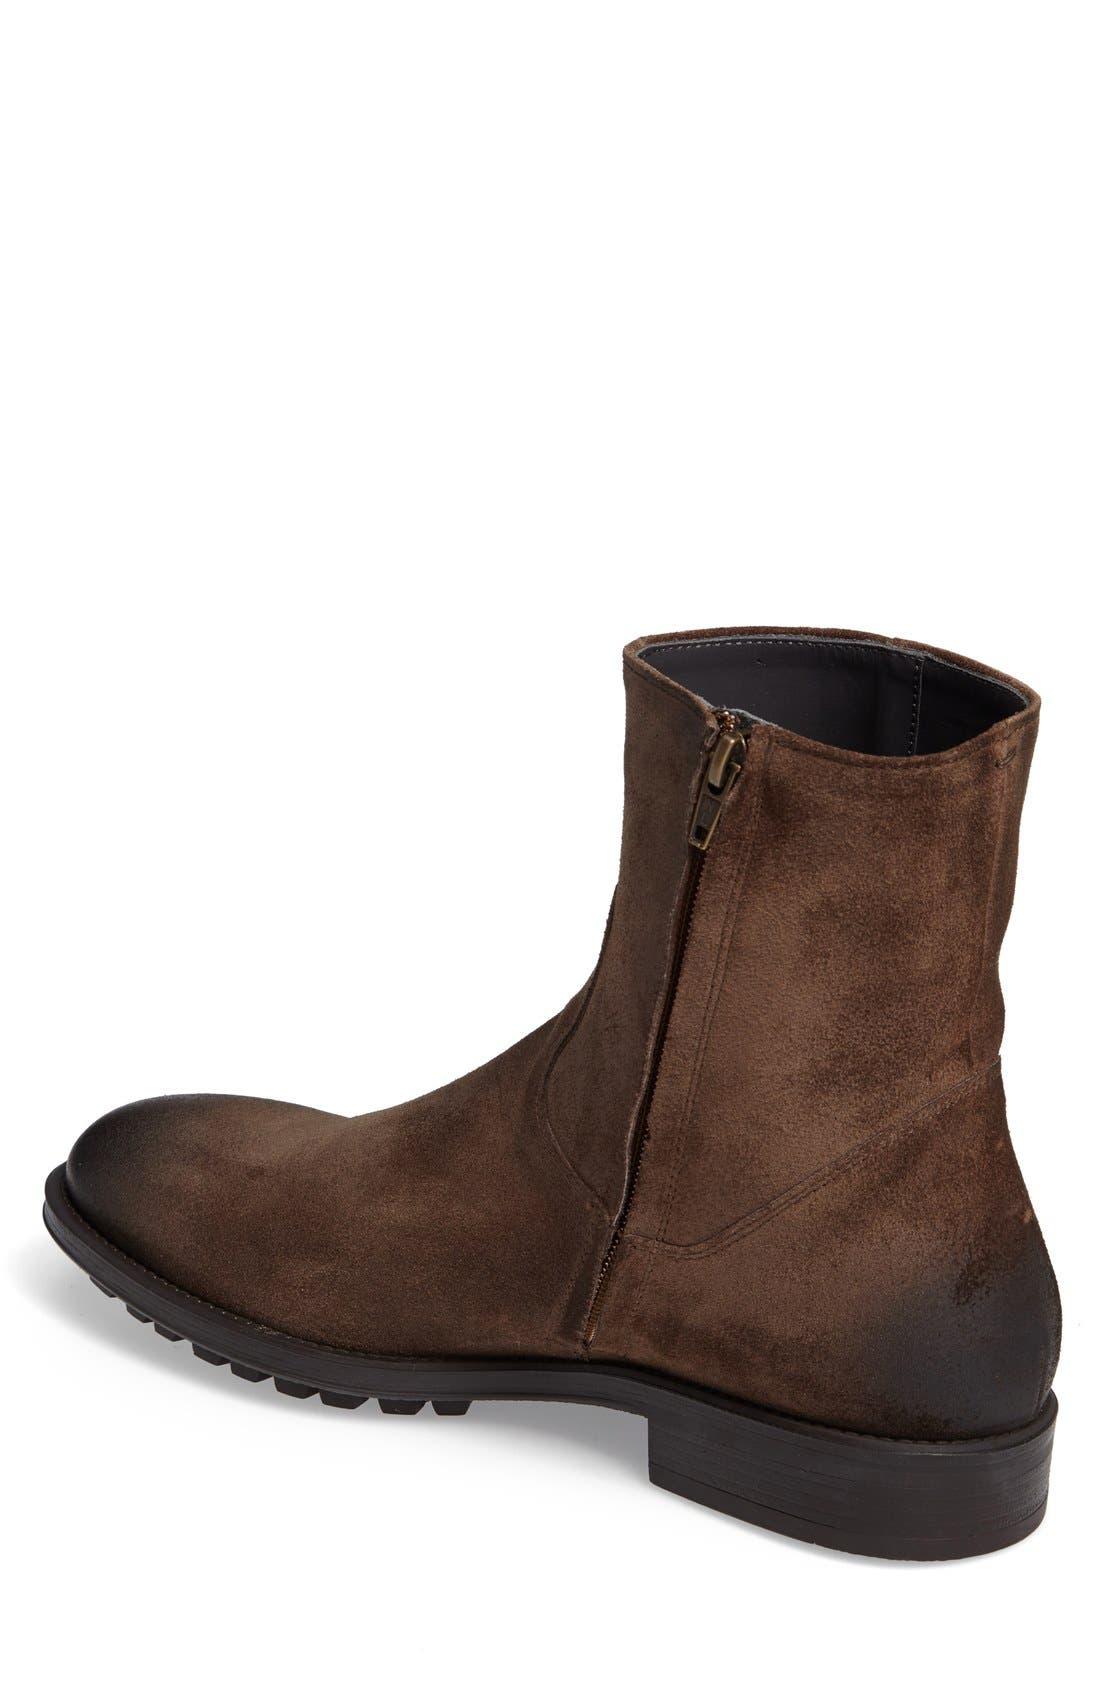 'Harrison' Zip Boot,                             Alternate thumbnail 2, color,                             Brown